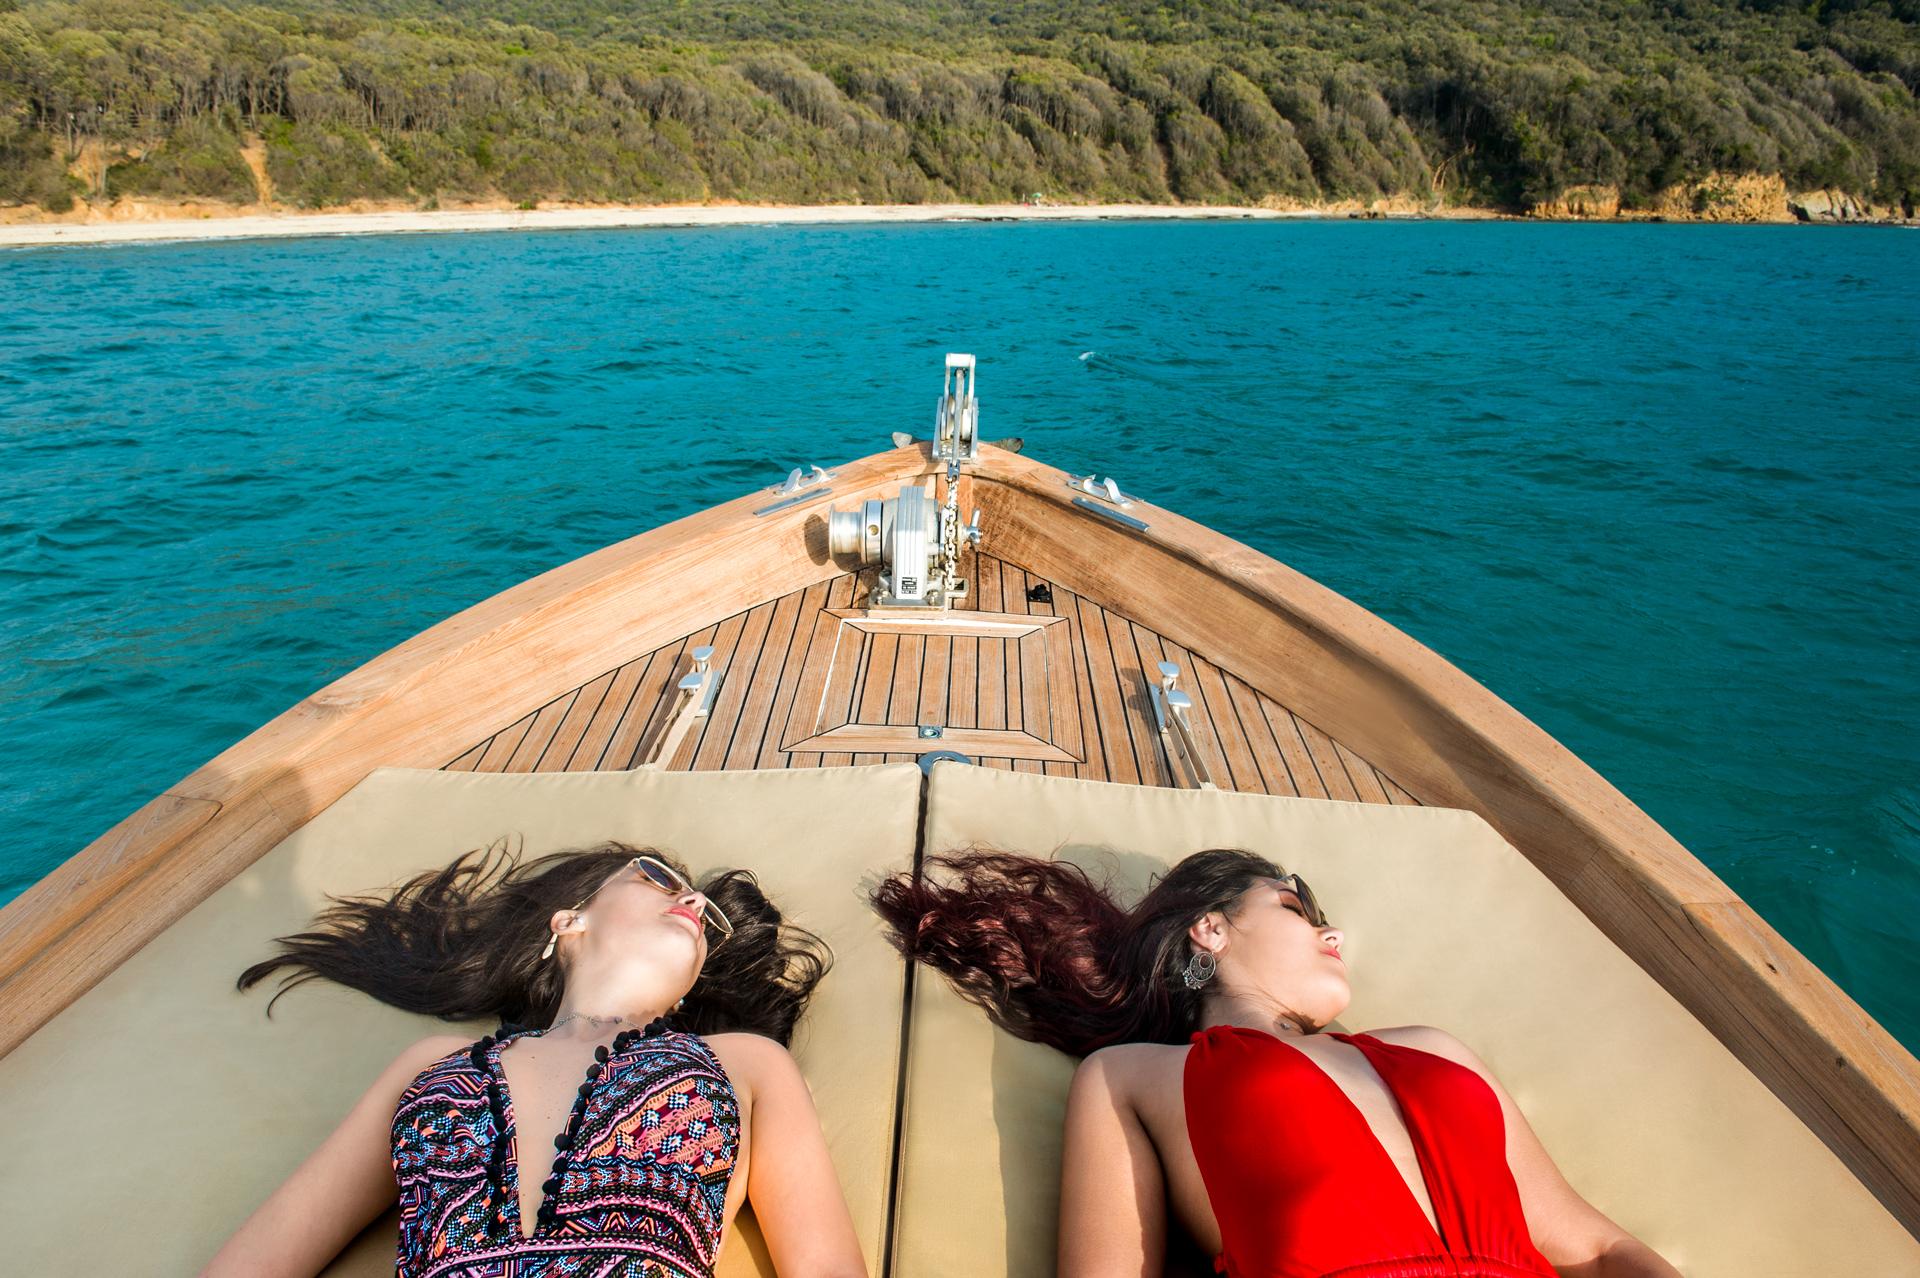 Cala Violina Boat Tour